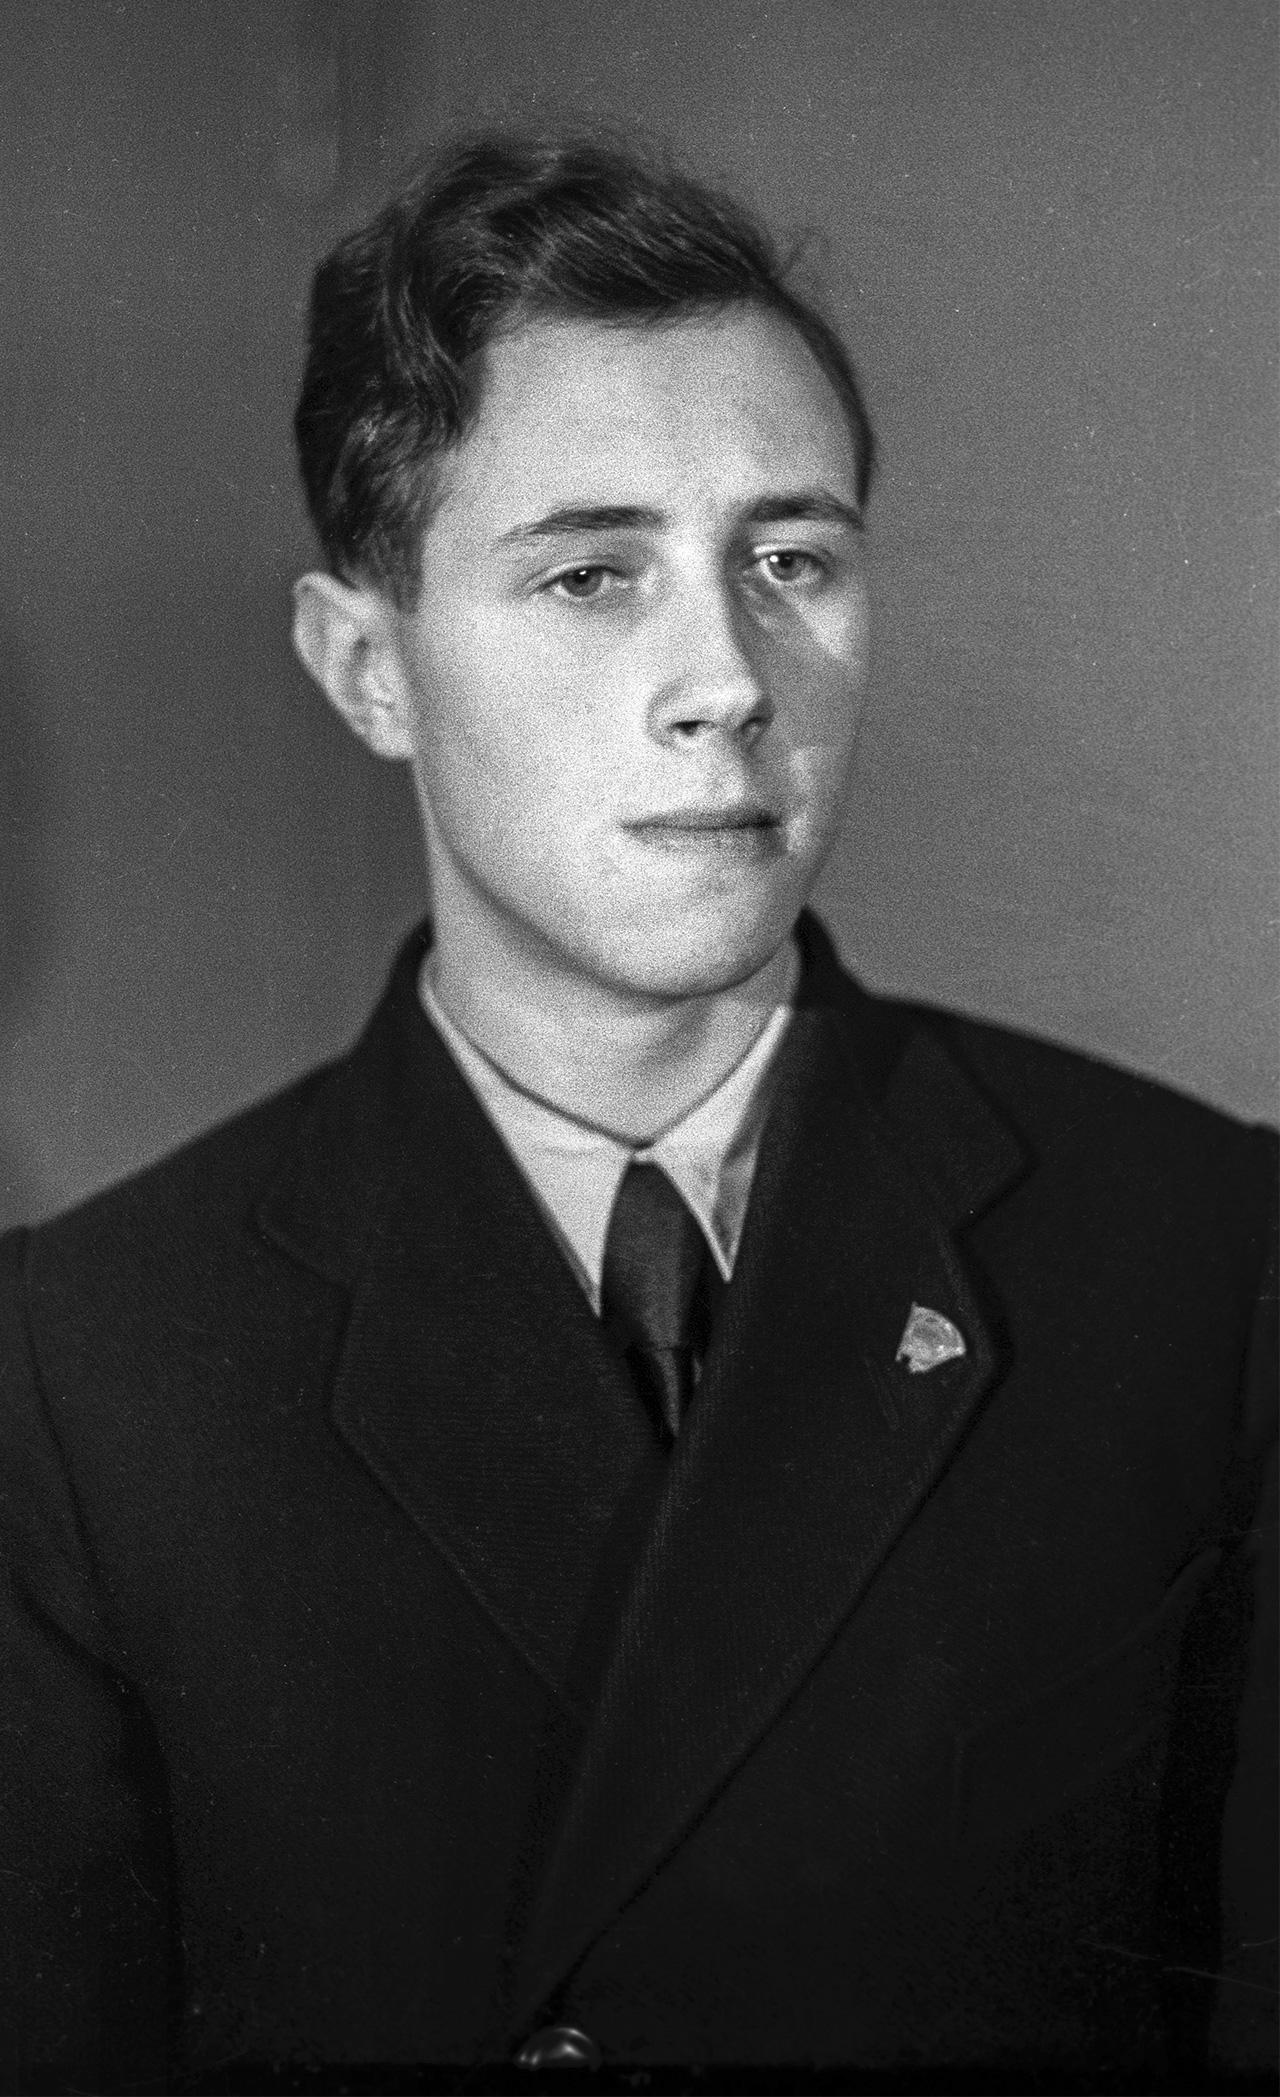 Mstislav Rostropovich, winner of the 3rd National Contest of Musicians, in 1945. Source: Anatoliy Garanin